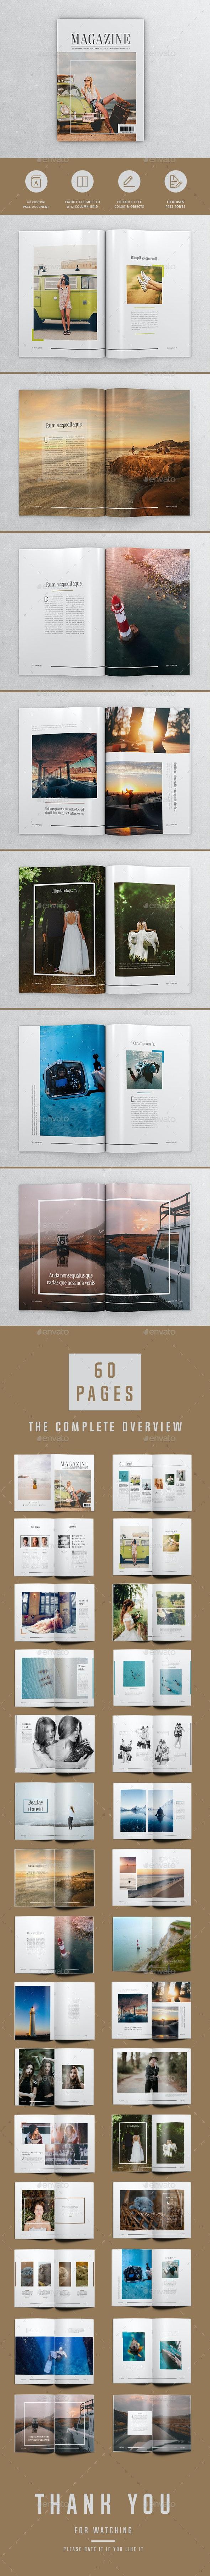 Magazine - Magazines Print Templates